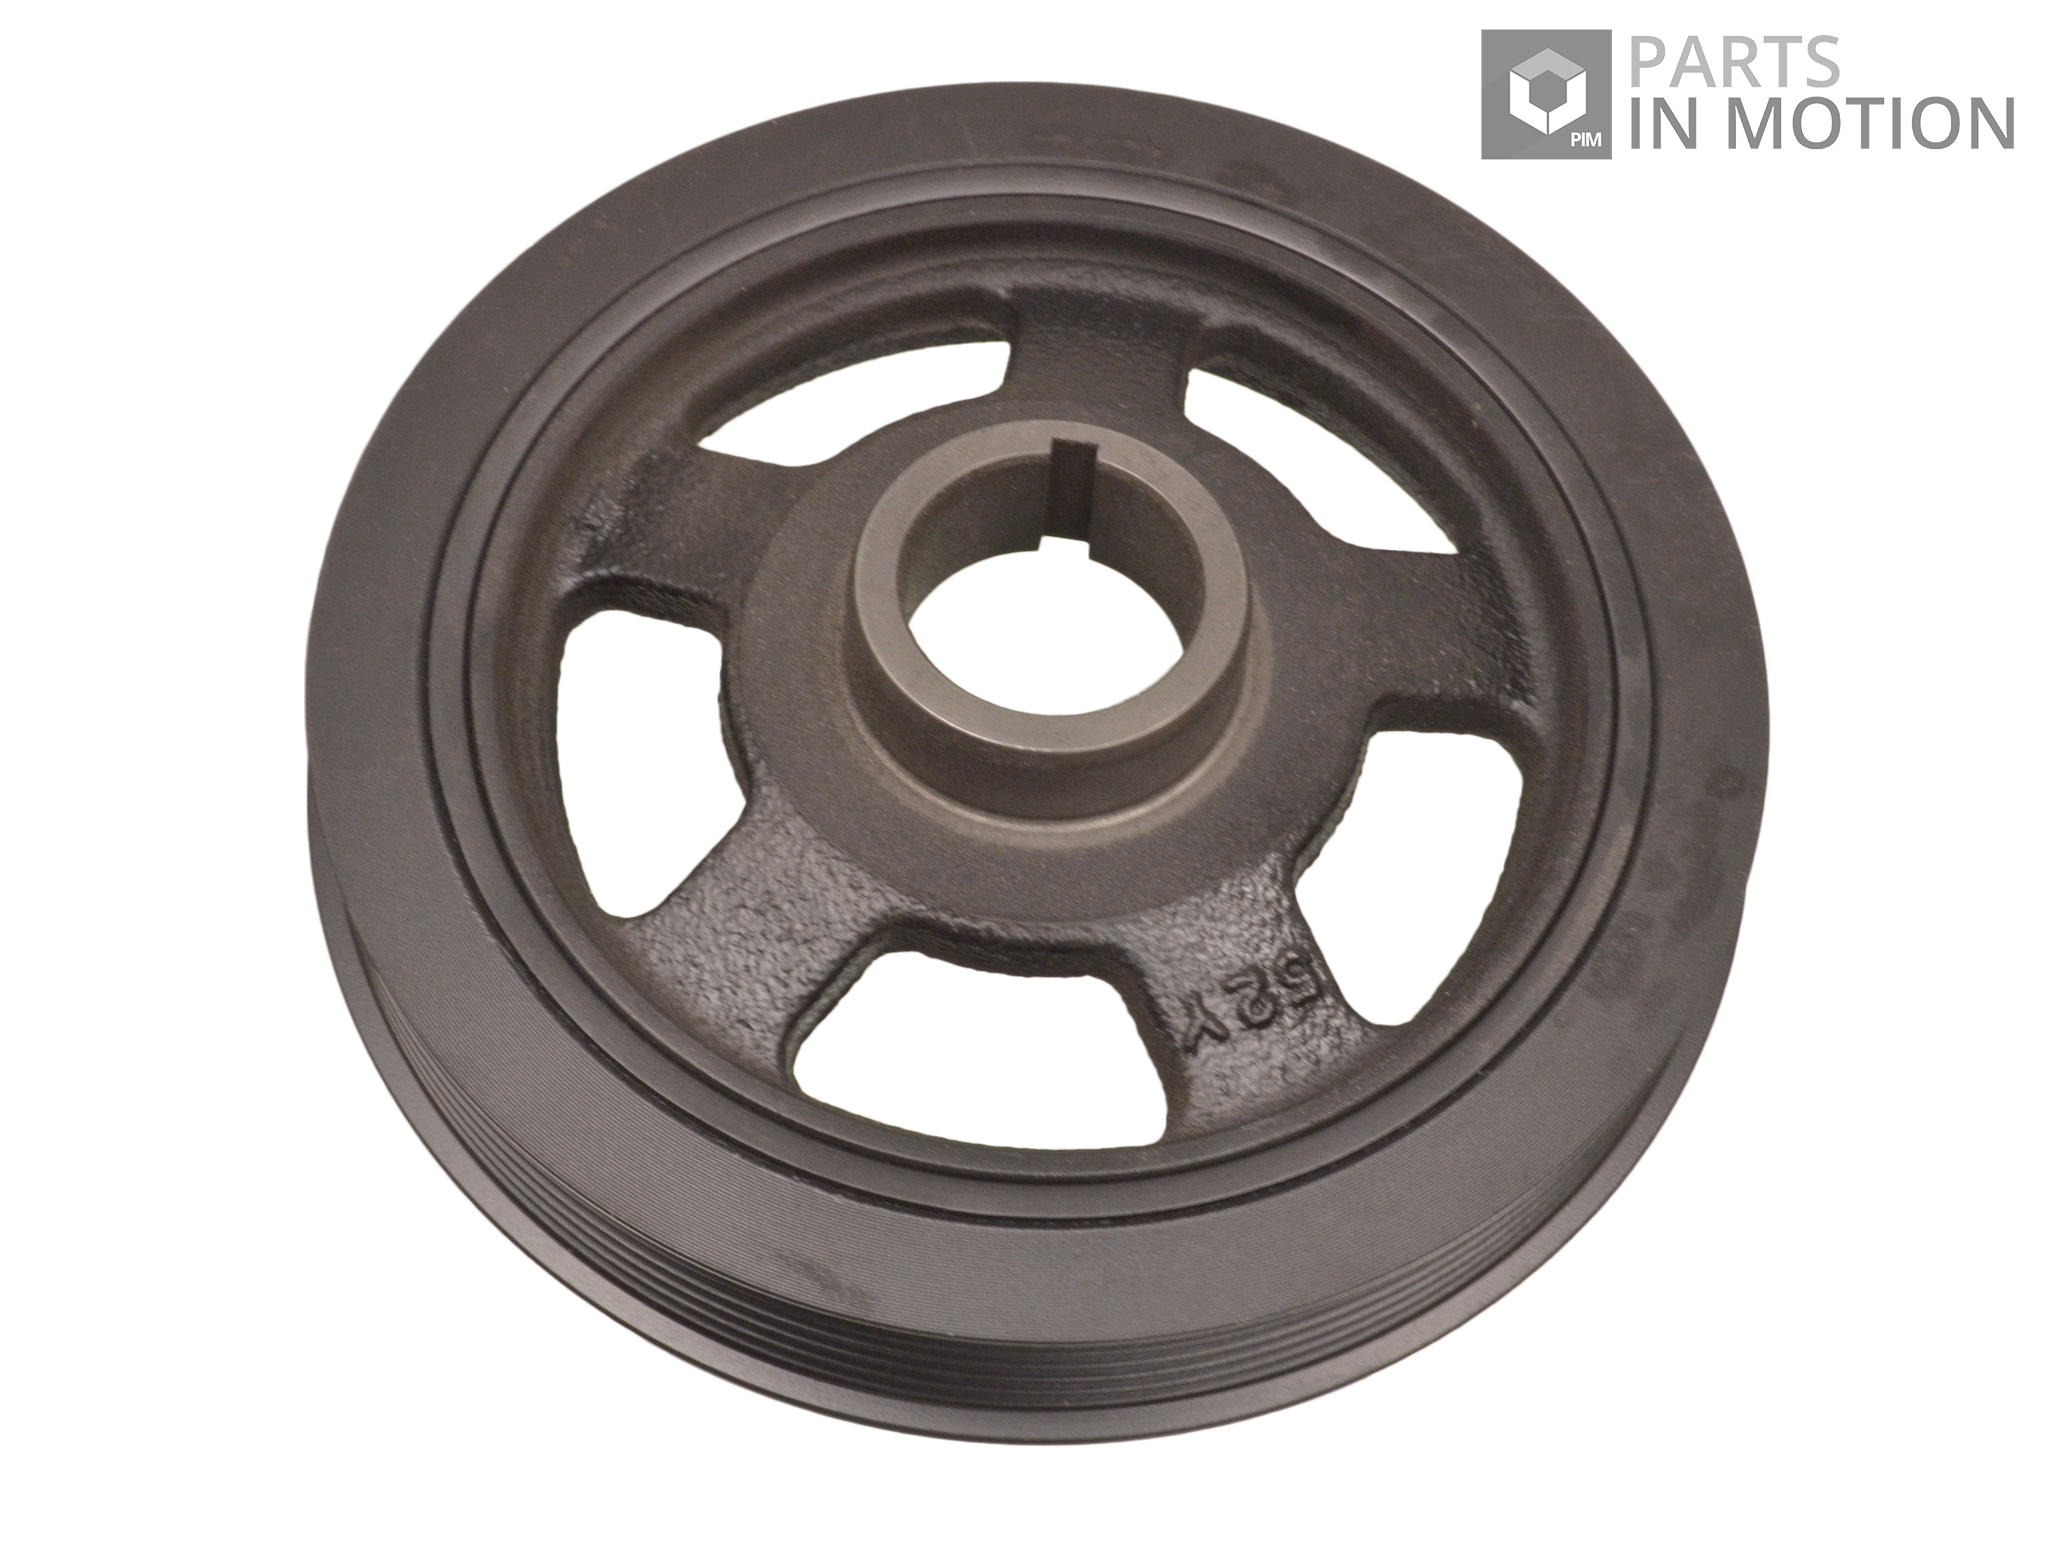 Crankshaft Pulley ADG06112 Blue Print Belt 231242A001 Top Quality Replacement